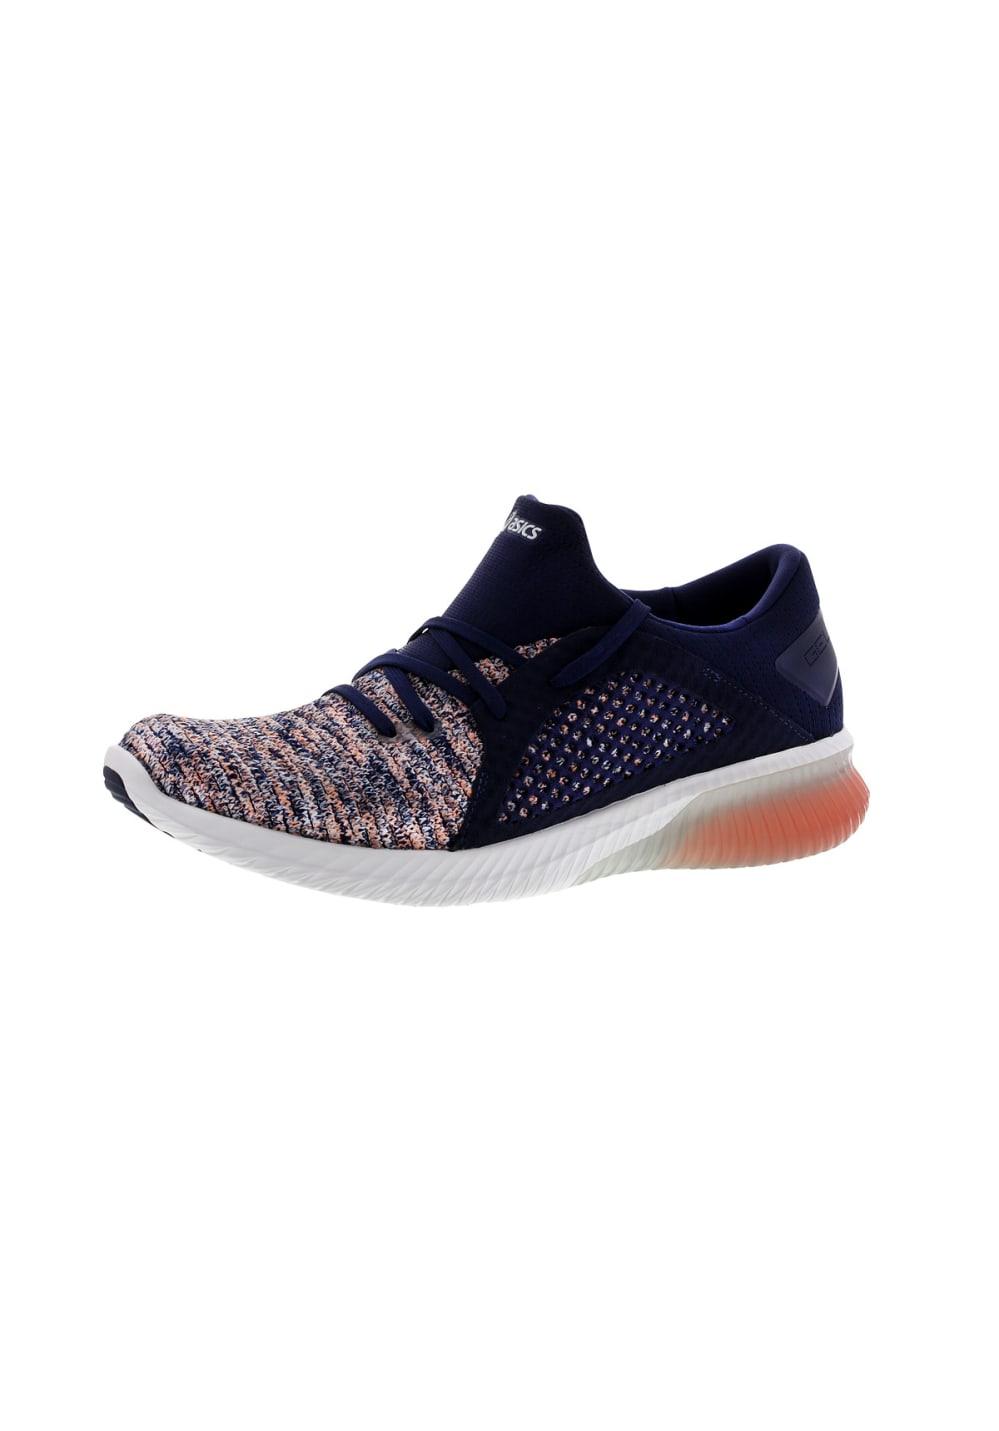 sale retailer 48840 baa76 ASICS GEL-Kenun Knit - Running shoes for Women - Blue